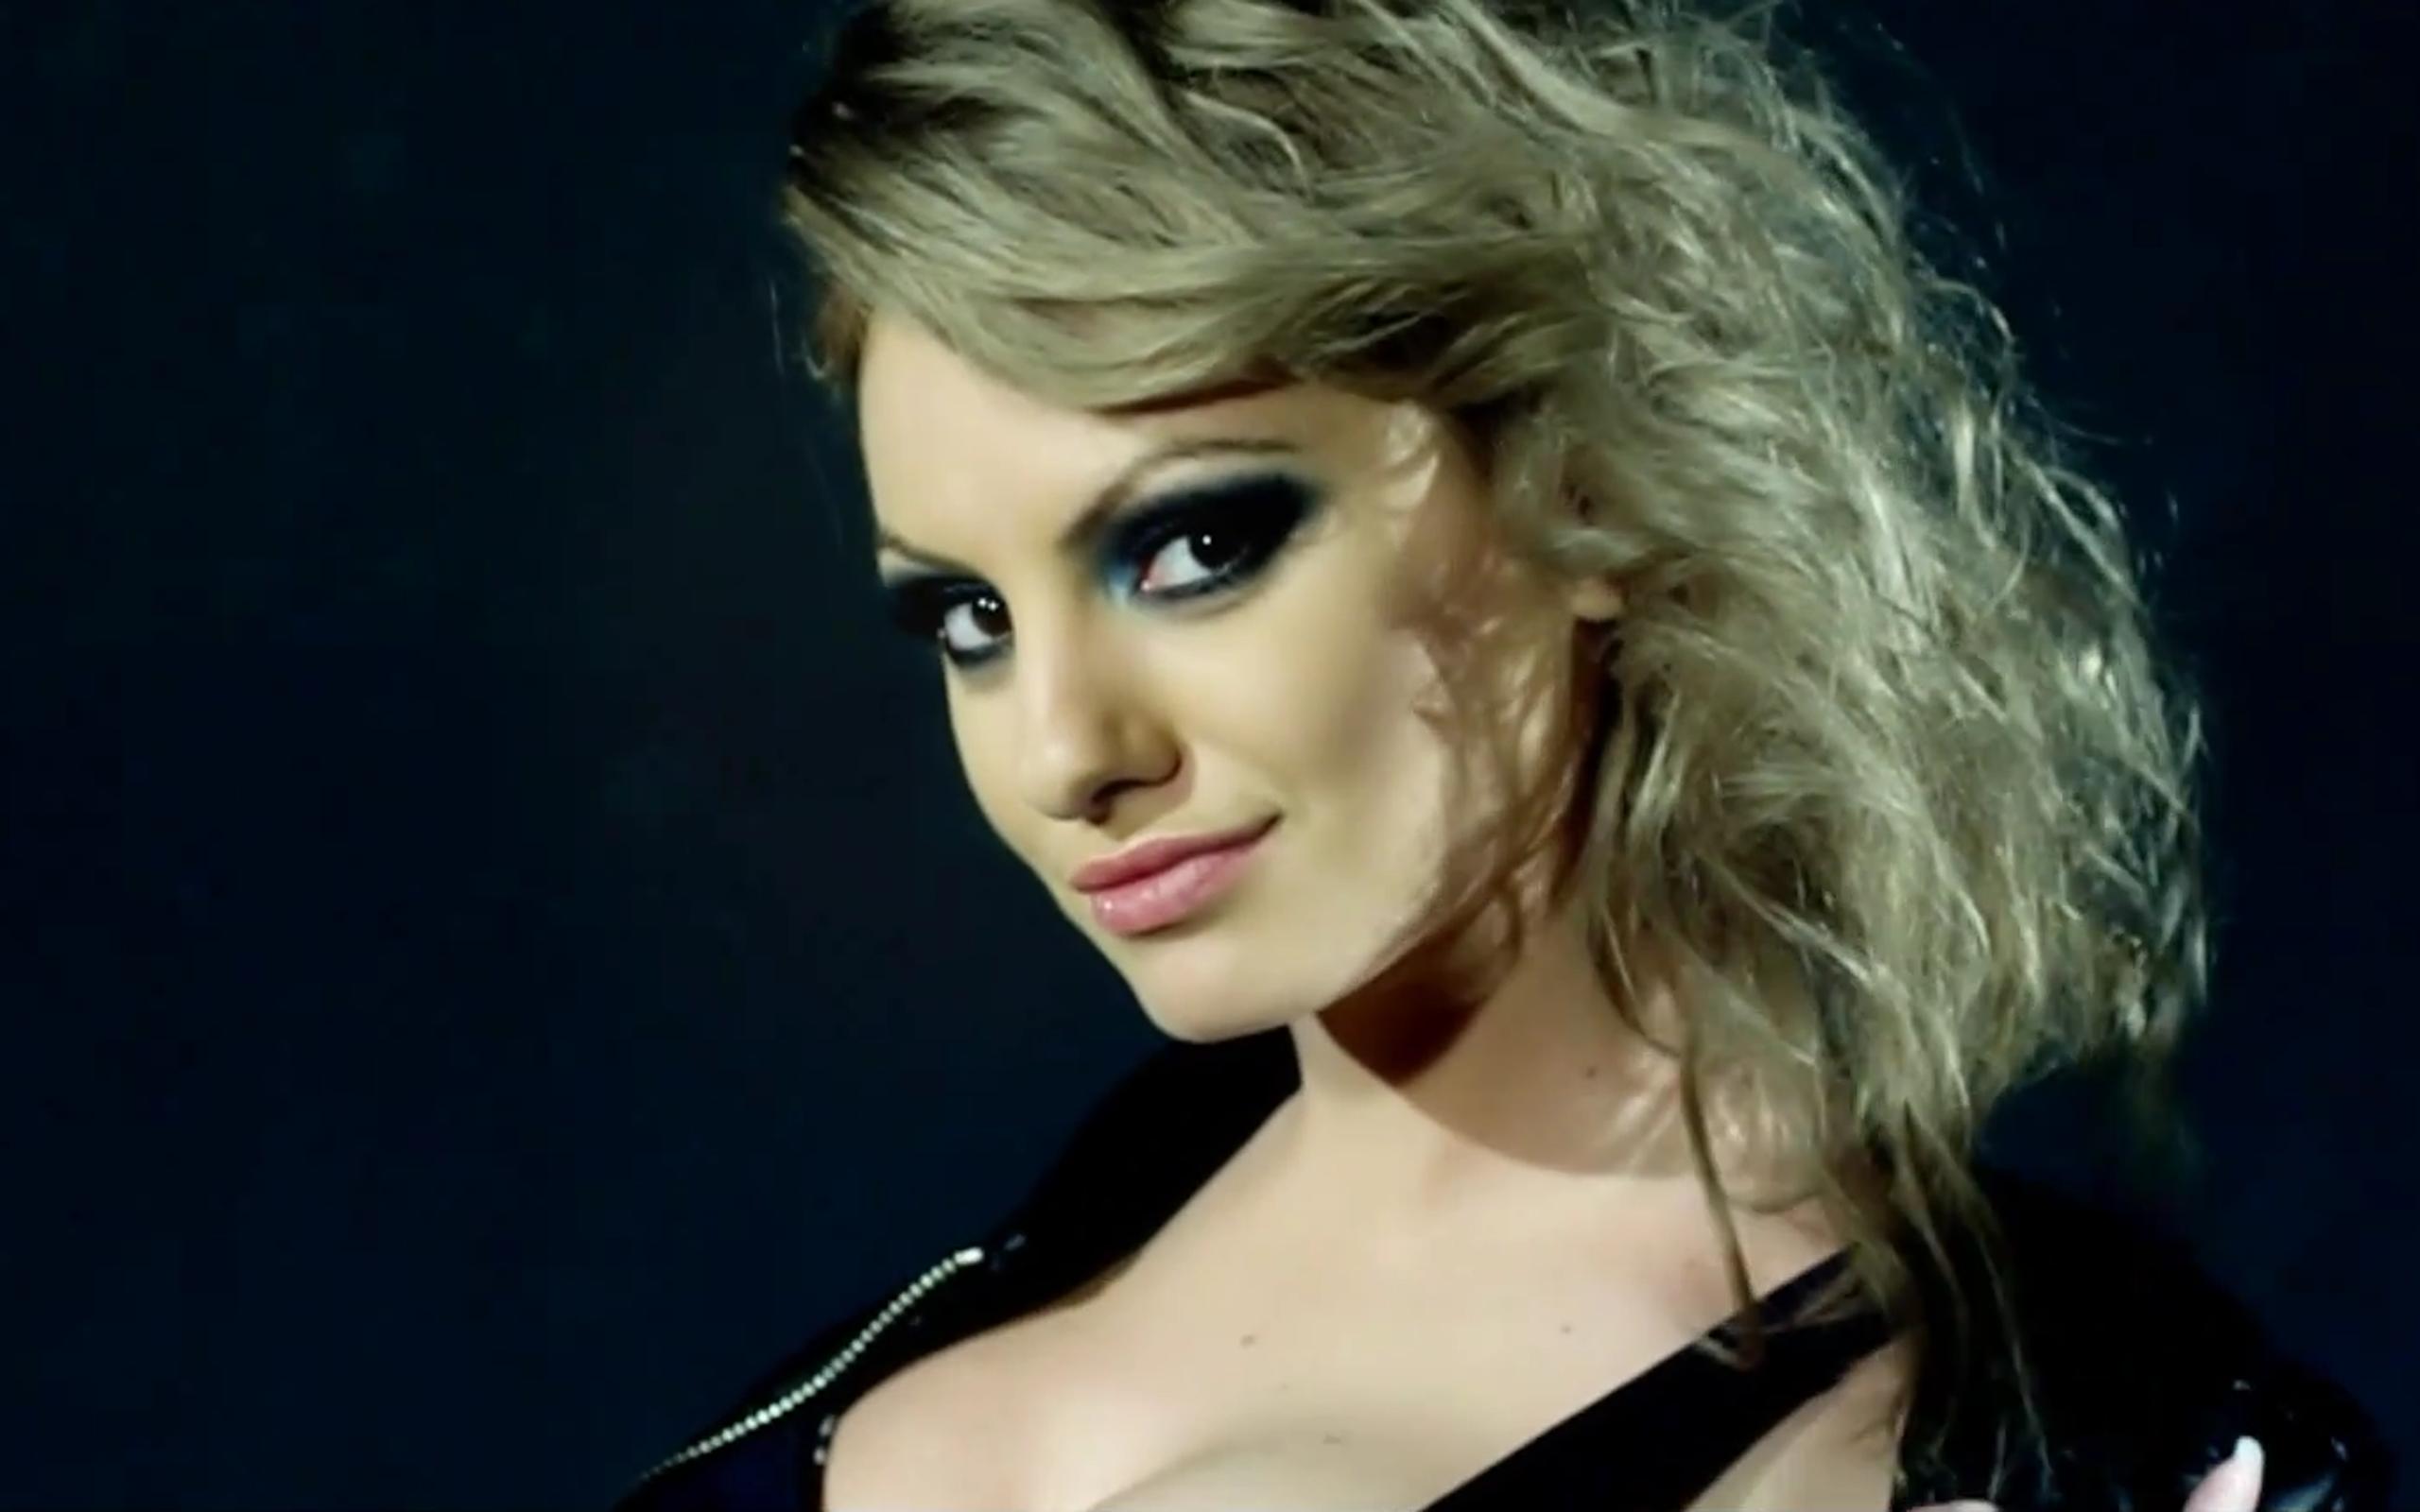 alexandra stan blonde beauty model wallpaper hd images